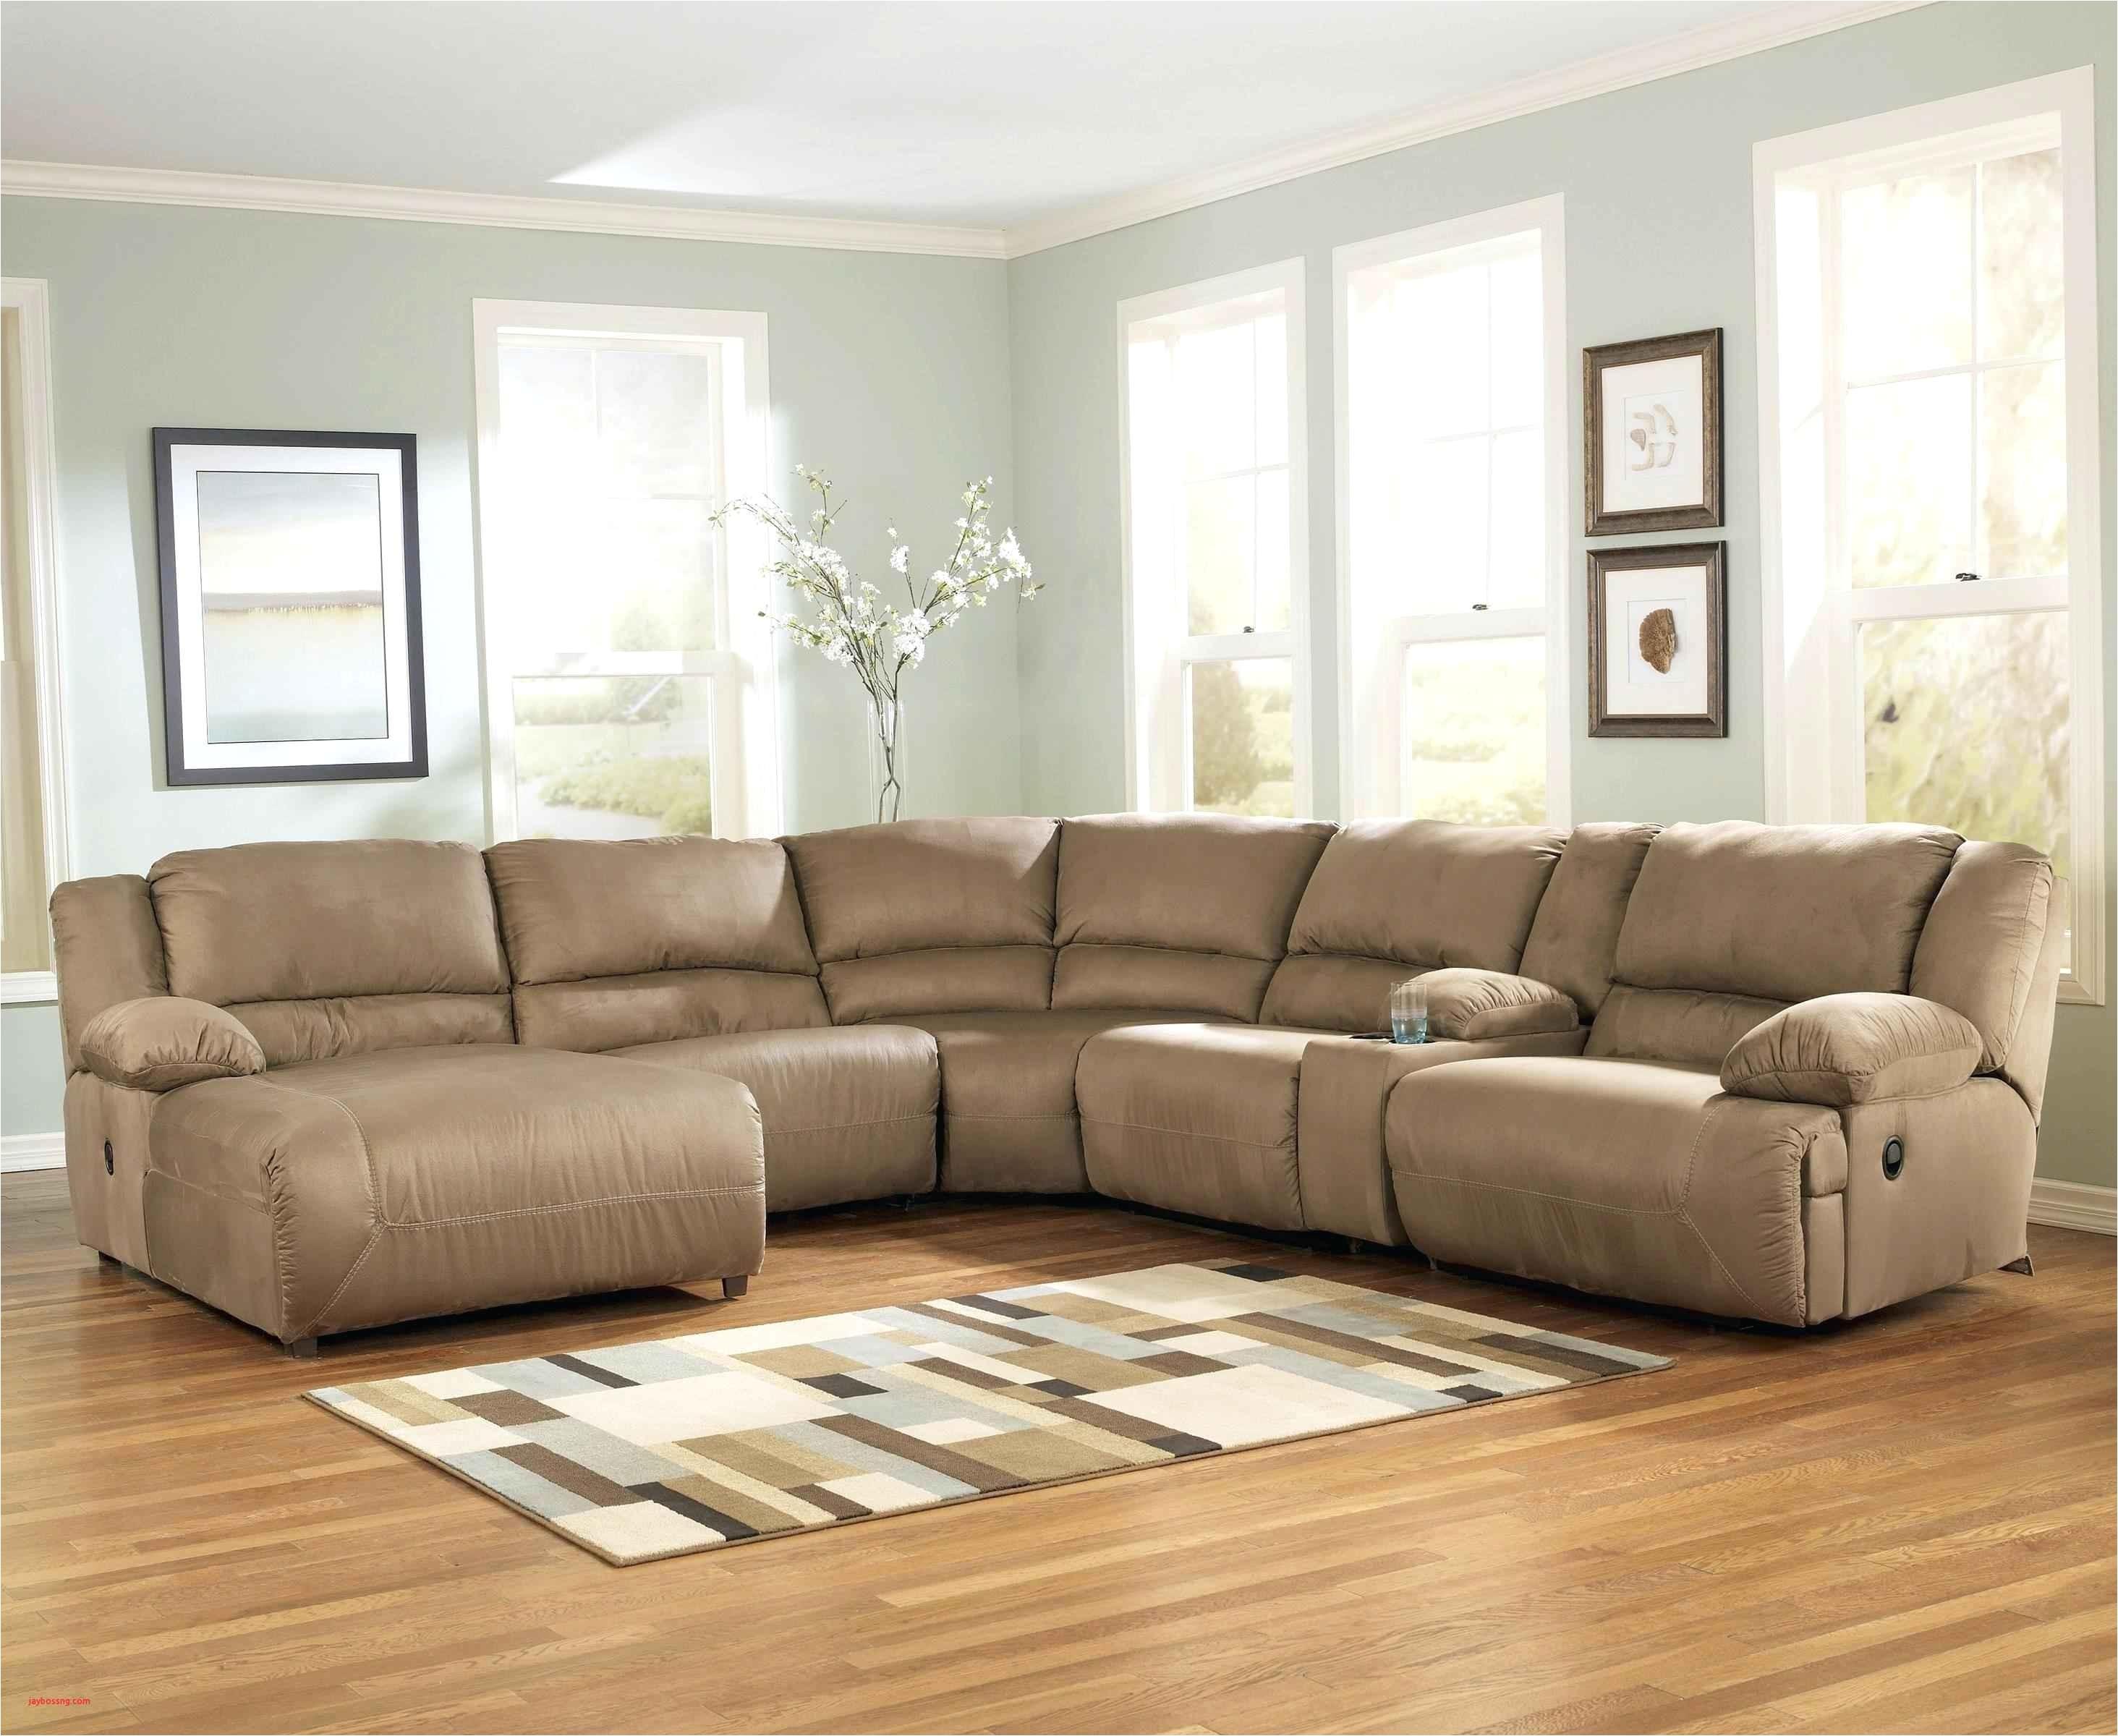 furniture stores near cleveland ohio inspirationa furniture store in boardman ohio elegant furniture ideas